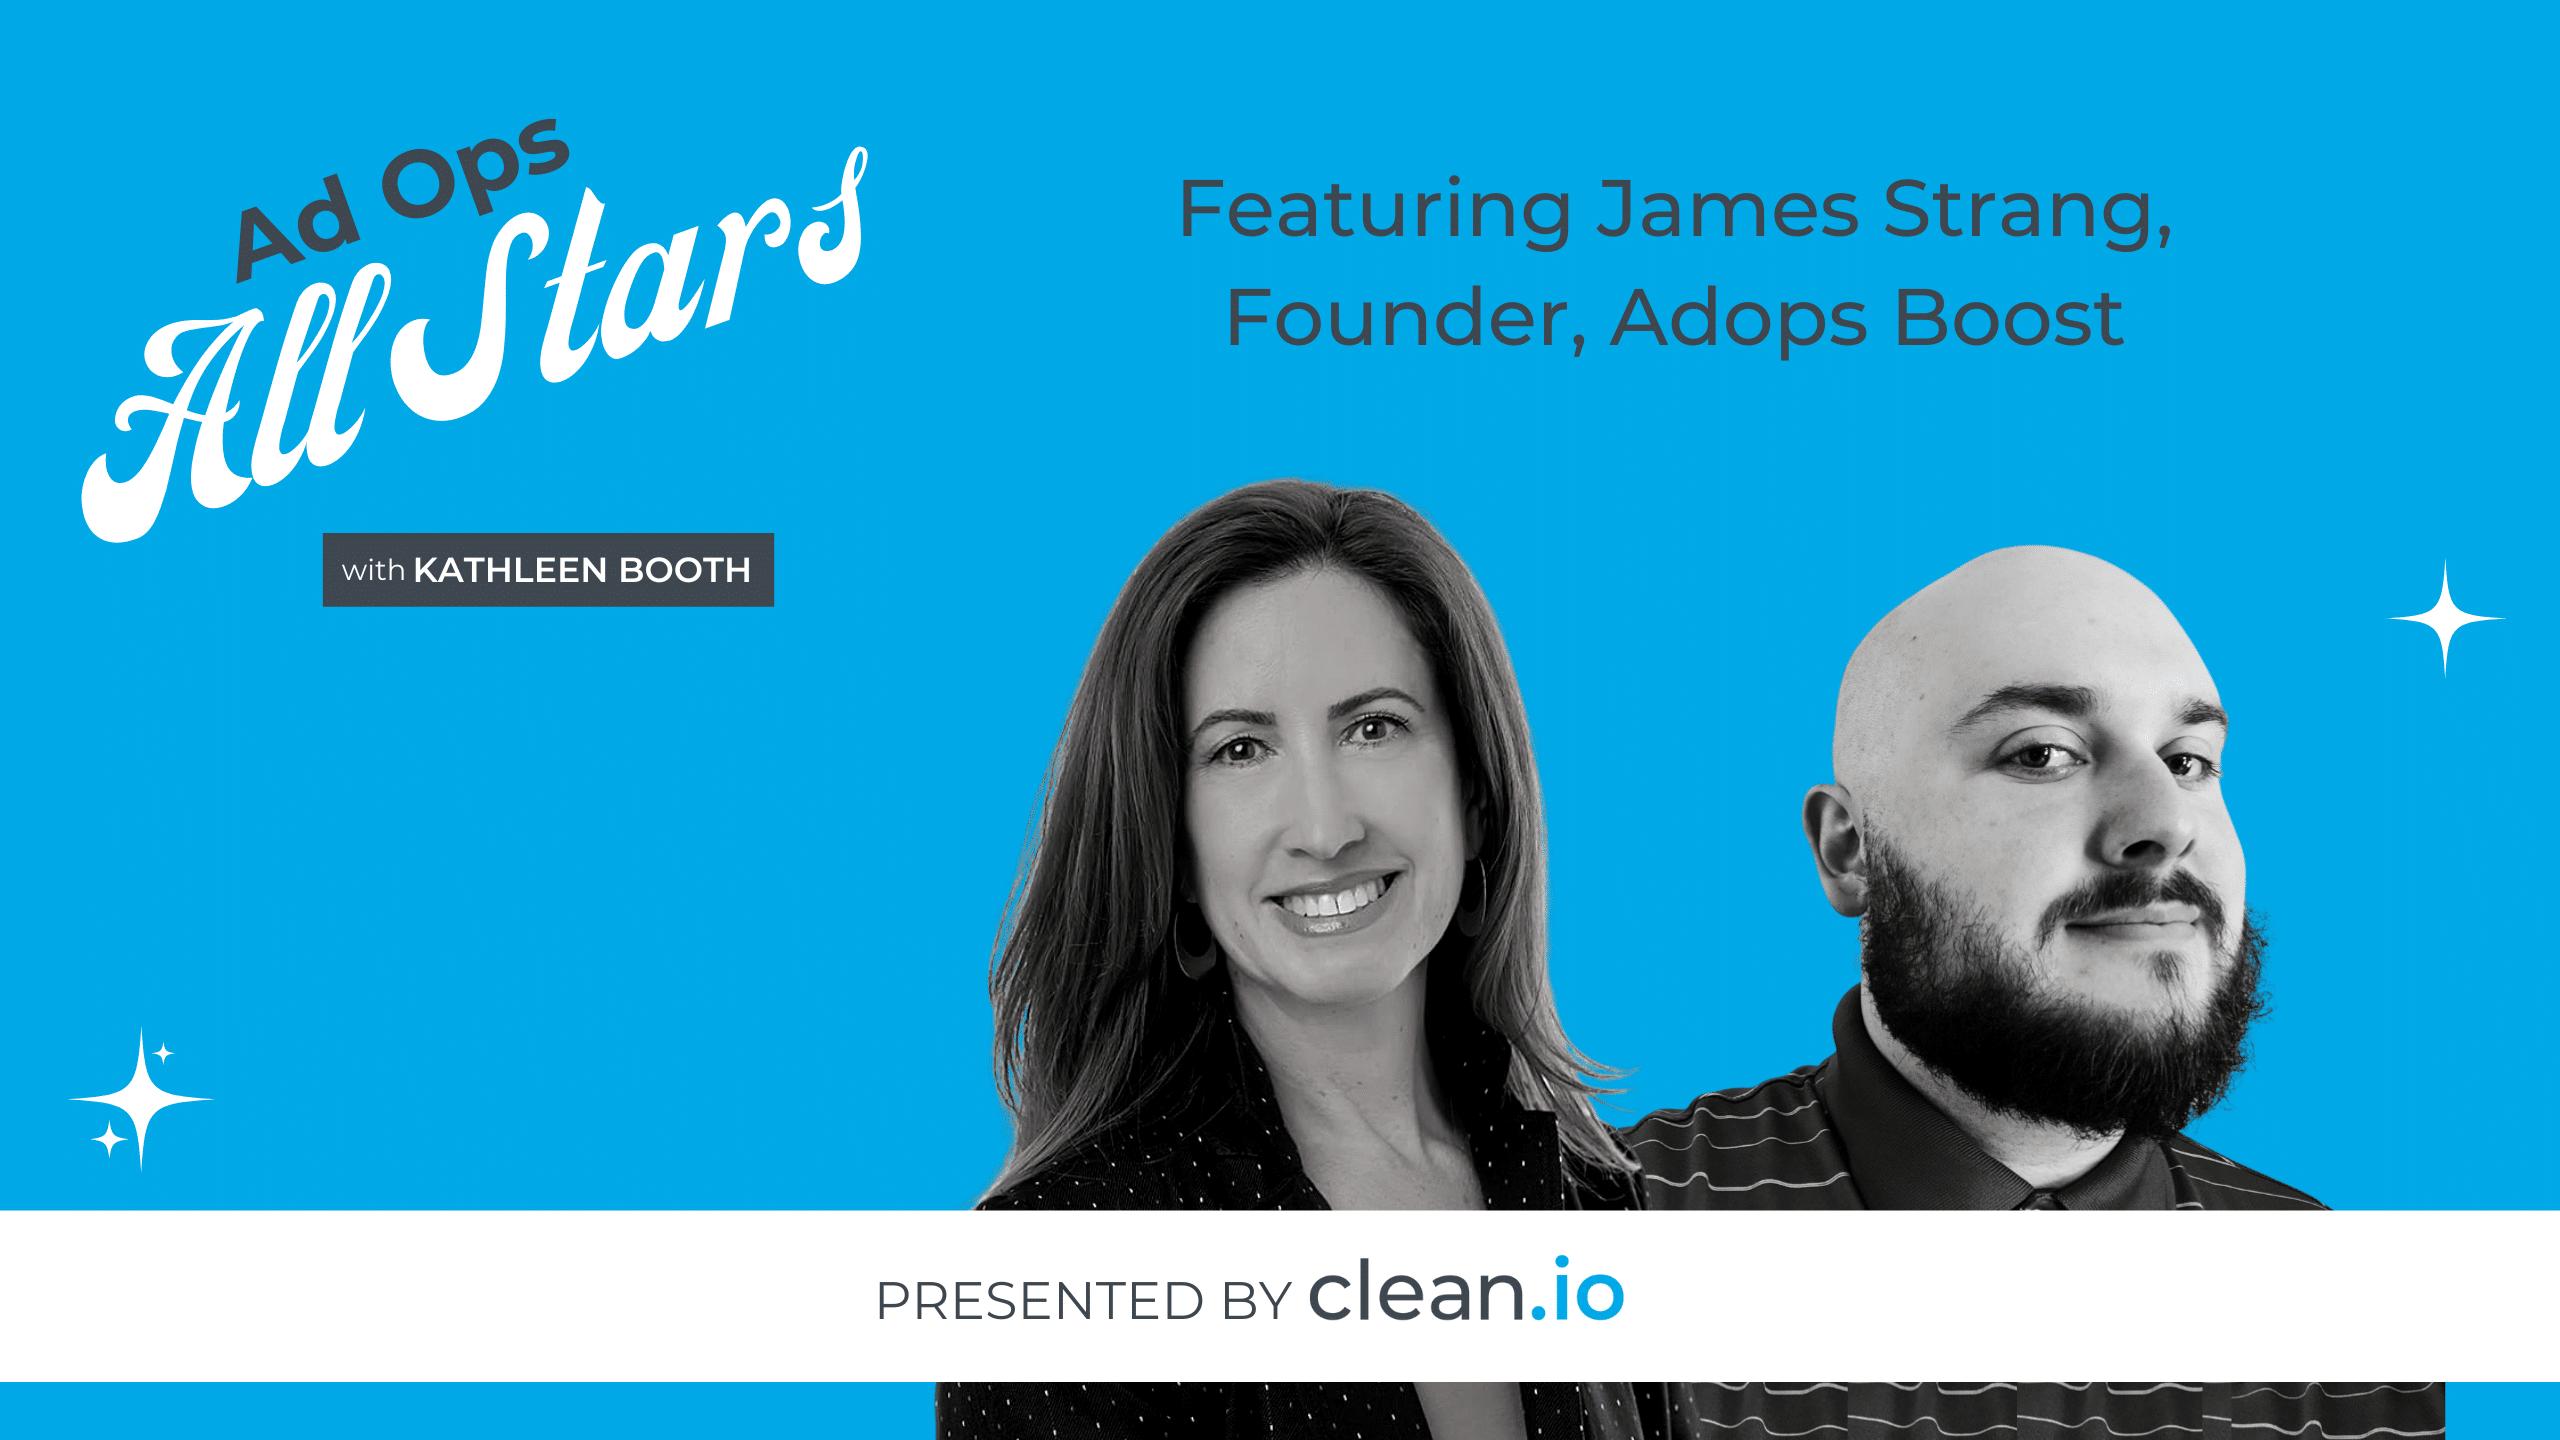 Ad Ops All Stars: James Strang, AdOps Boost